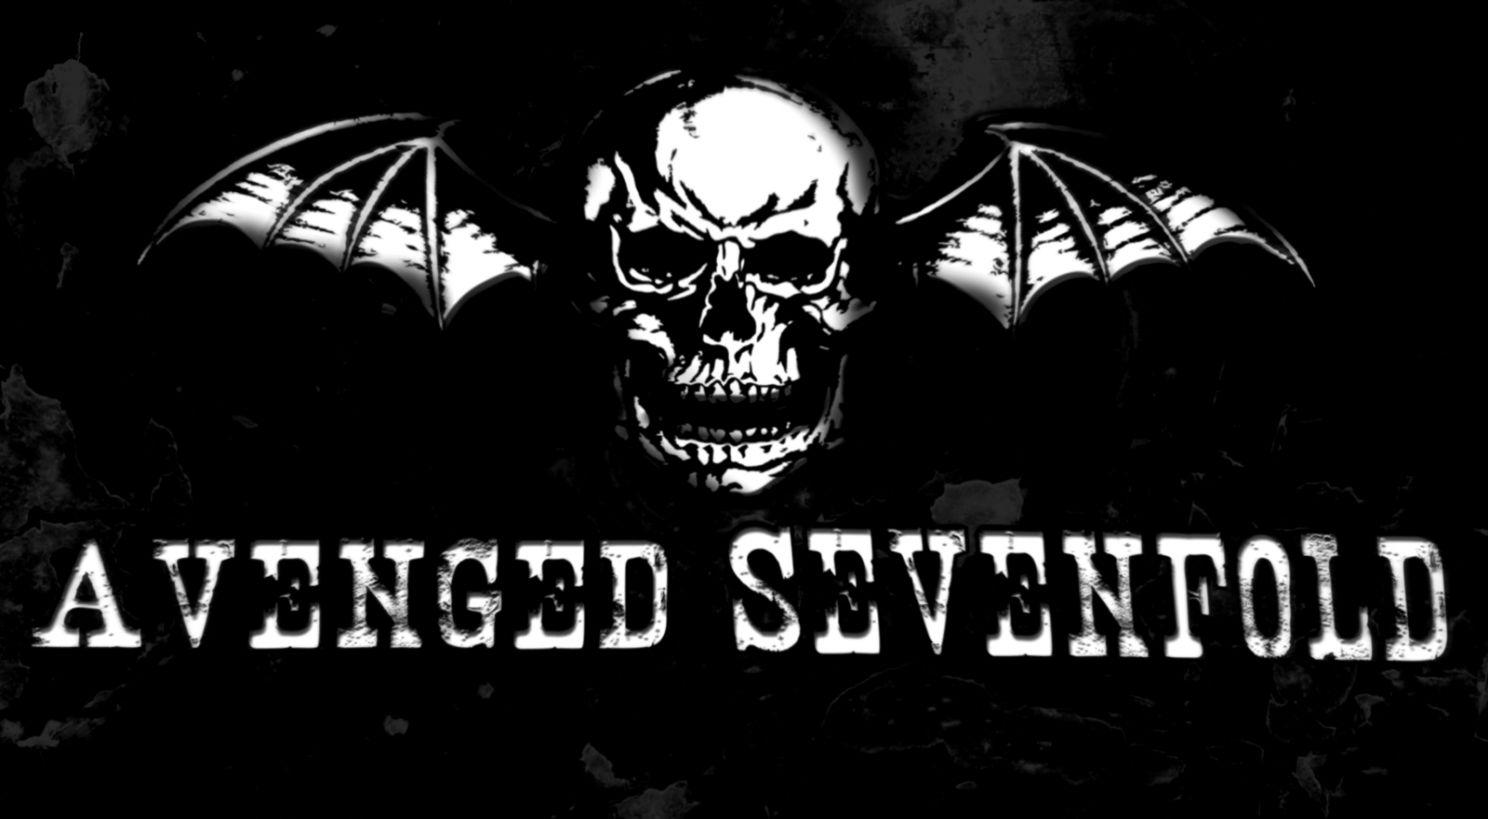 Avenged Sevenfold Desktop Background Wallpapers Record